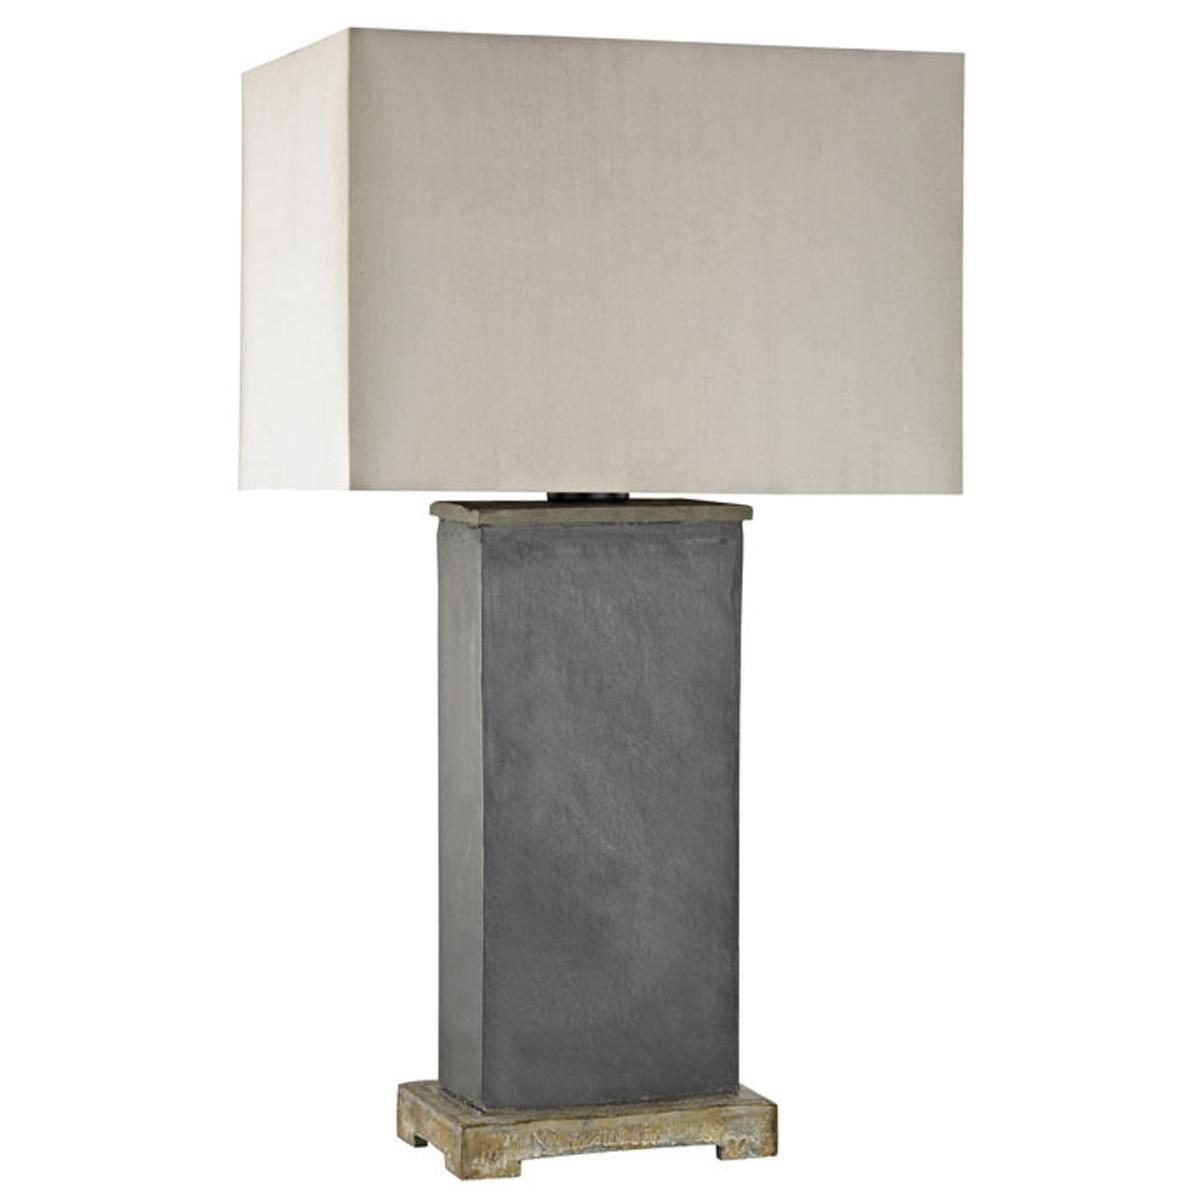 Indoor Outdoor Slate Column Table Lamp Outdoor Table Lamps